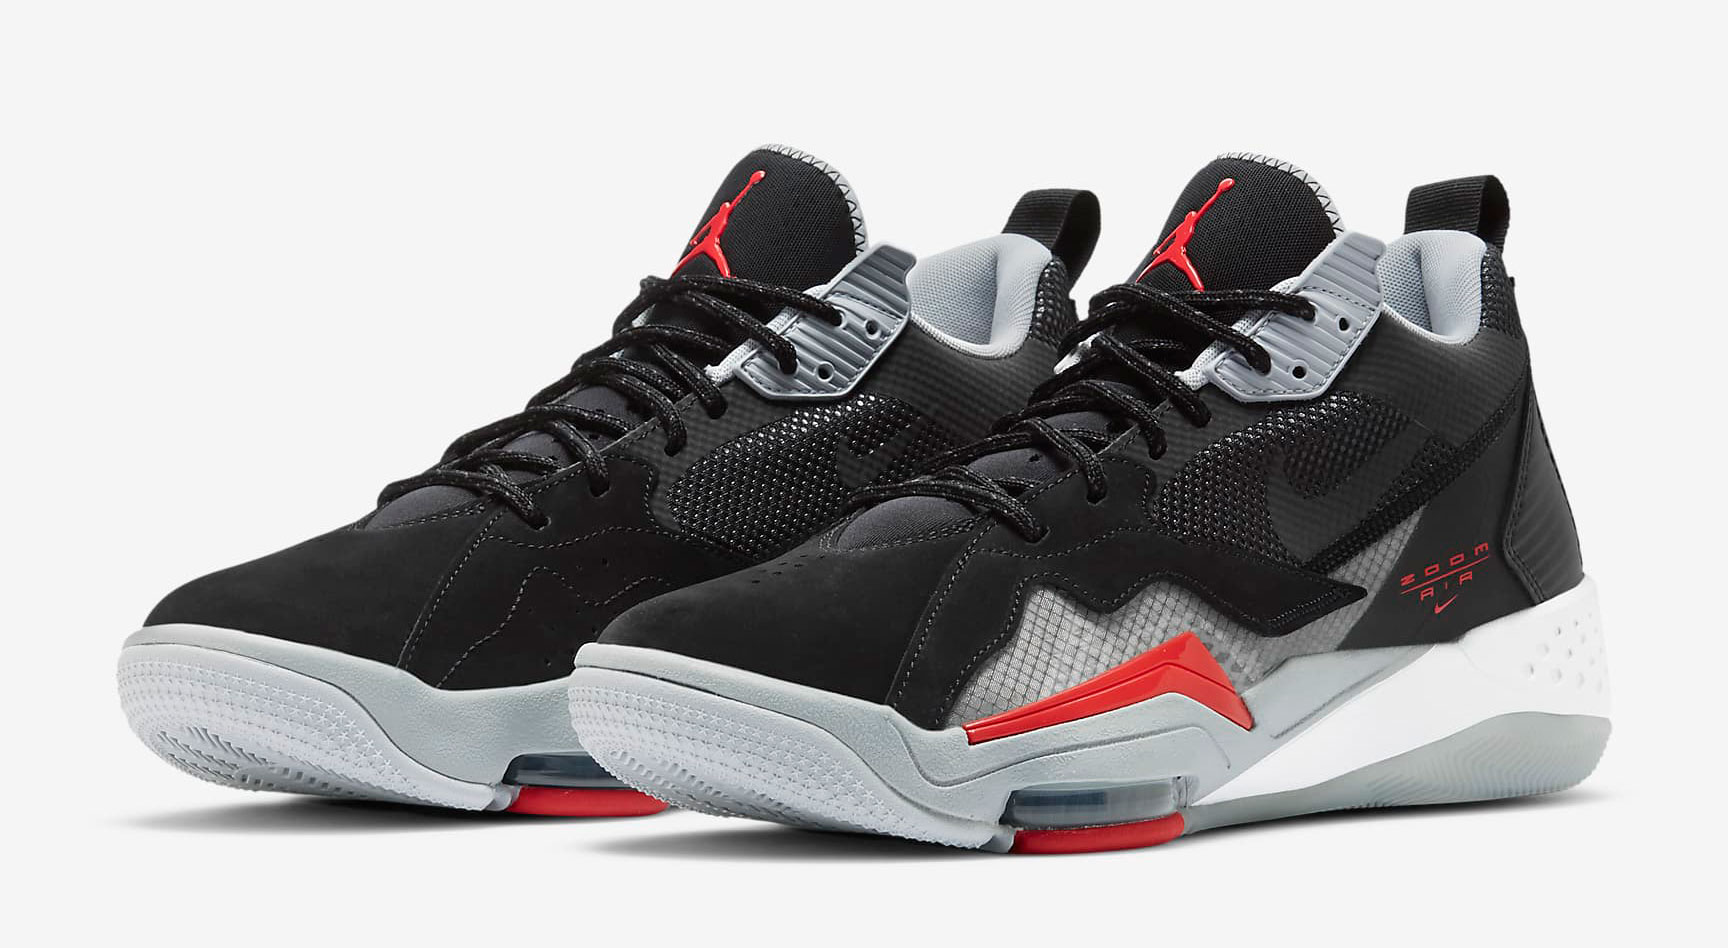 jordan-zoom-92-black-red-bred-cement-1